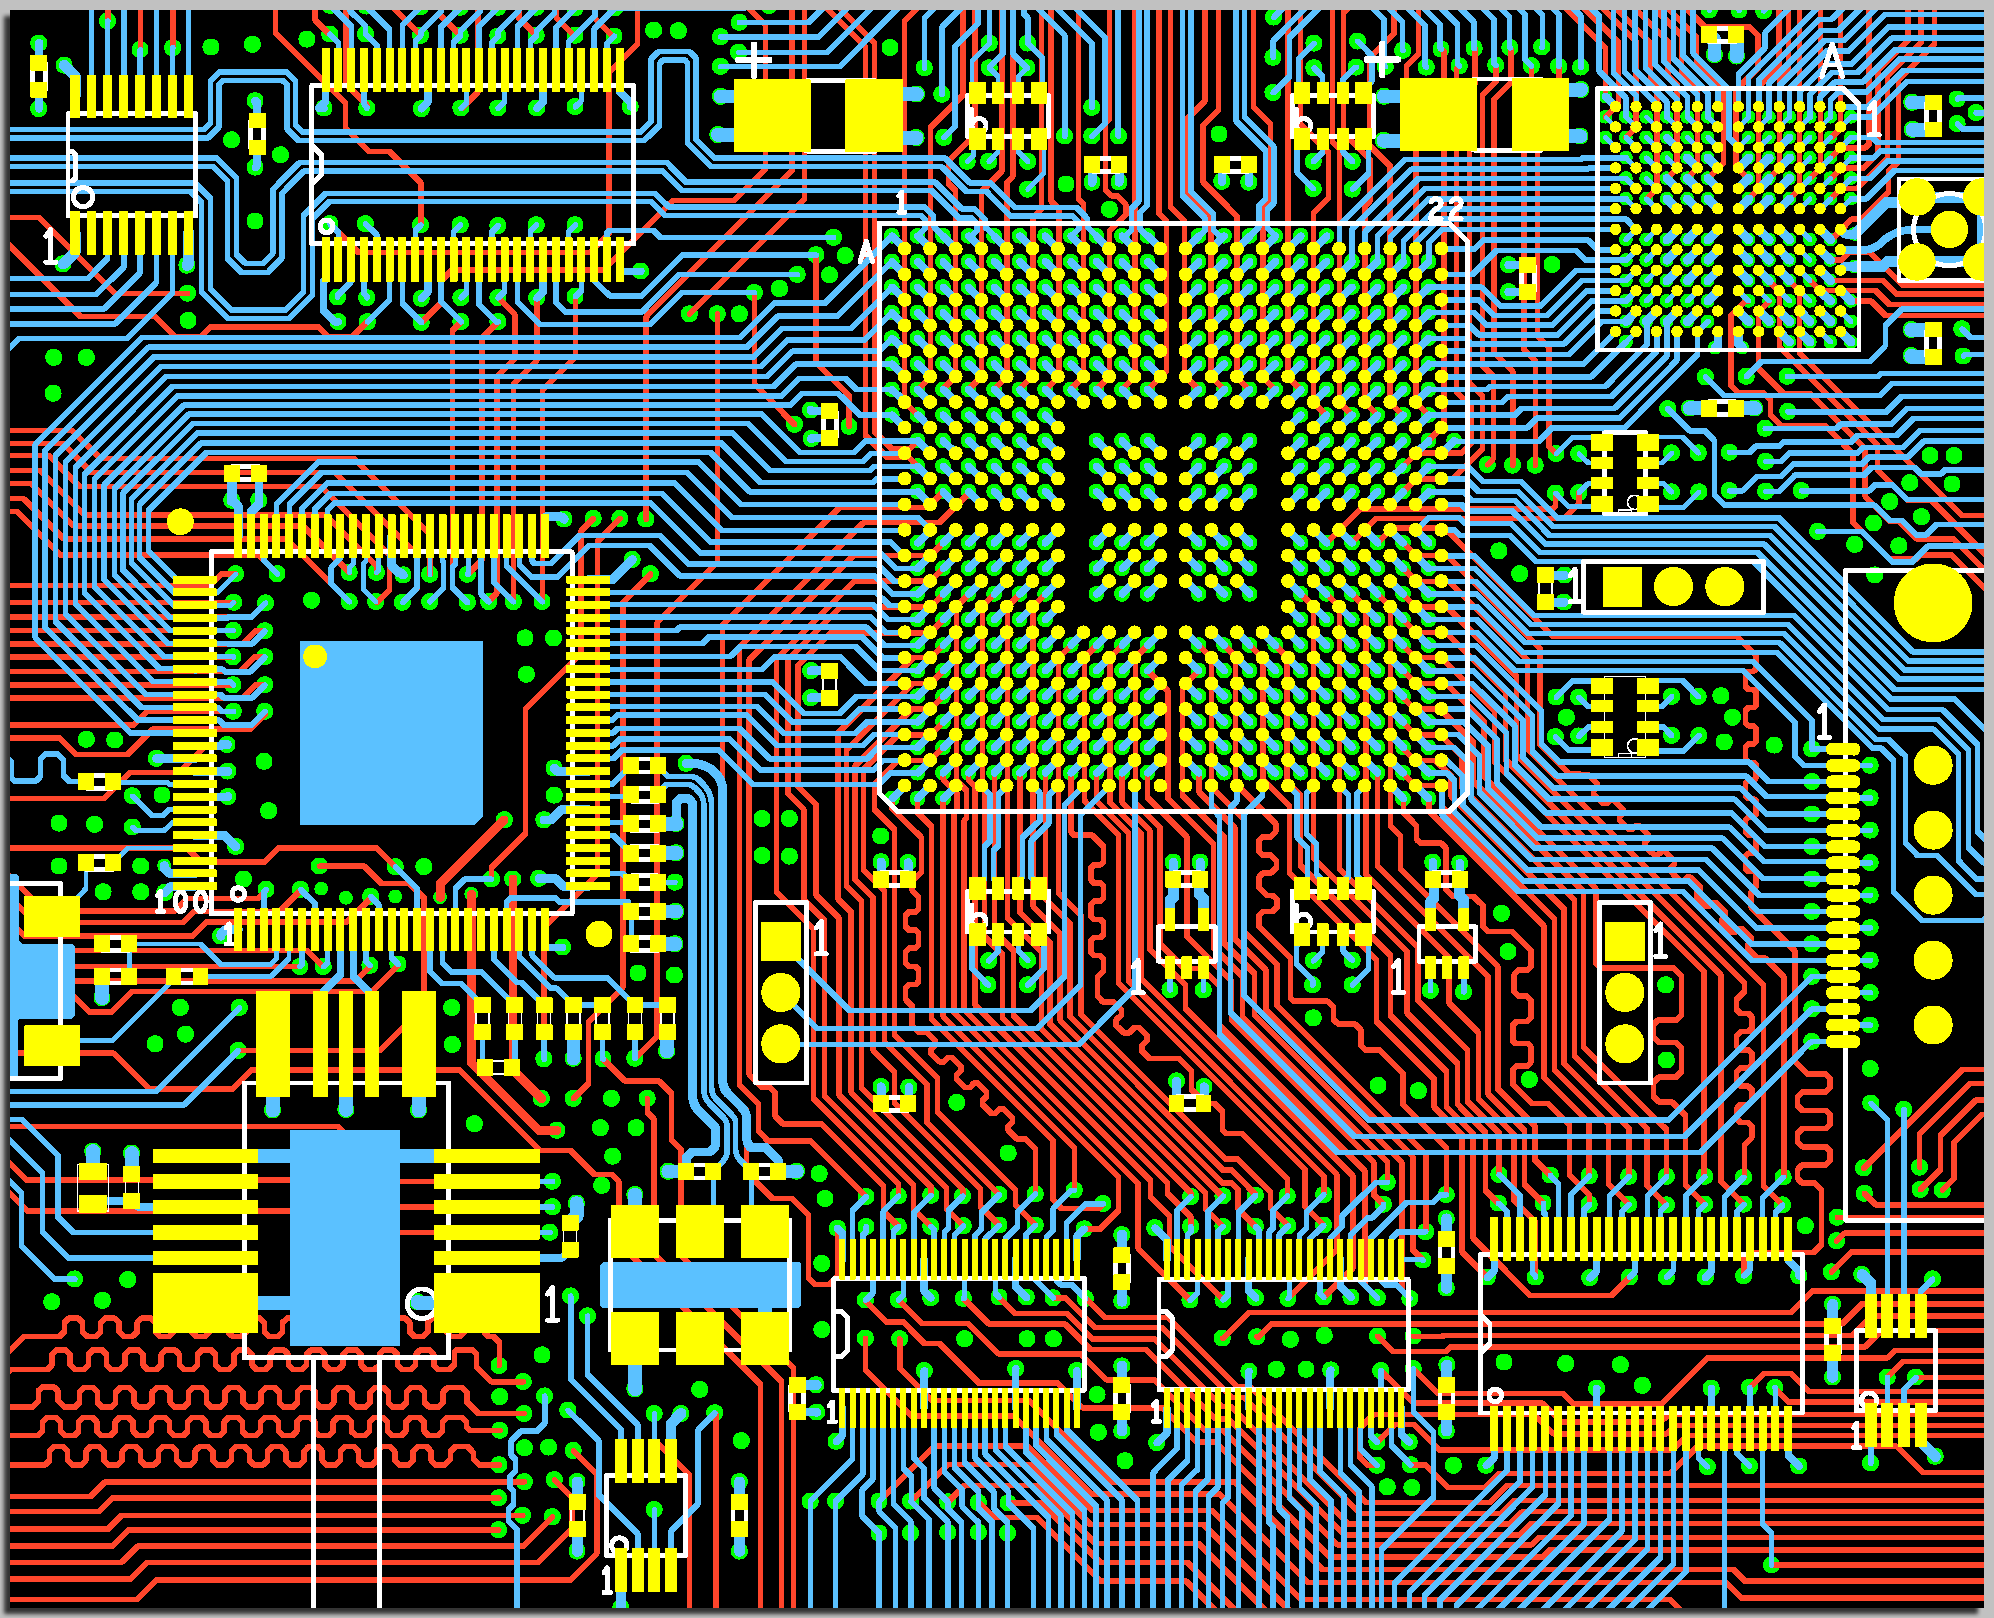 Pcb Design Checklist Circuit Board Design Circuit Design Electronics Workshop